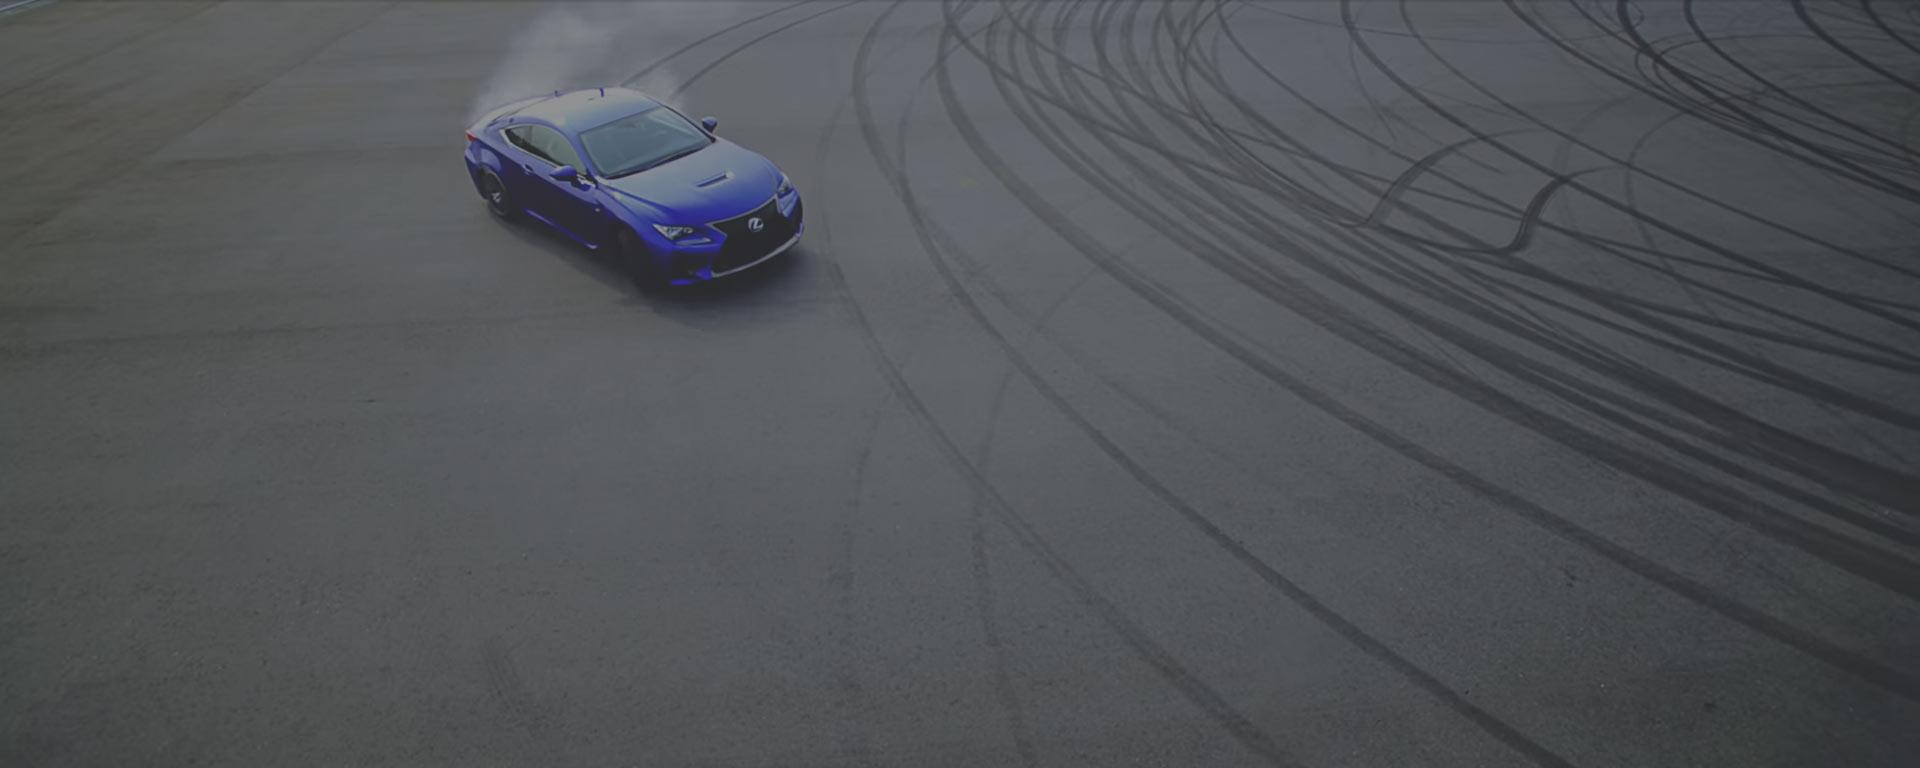 Vista superior de coche en circuito